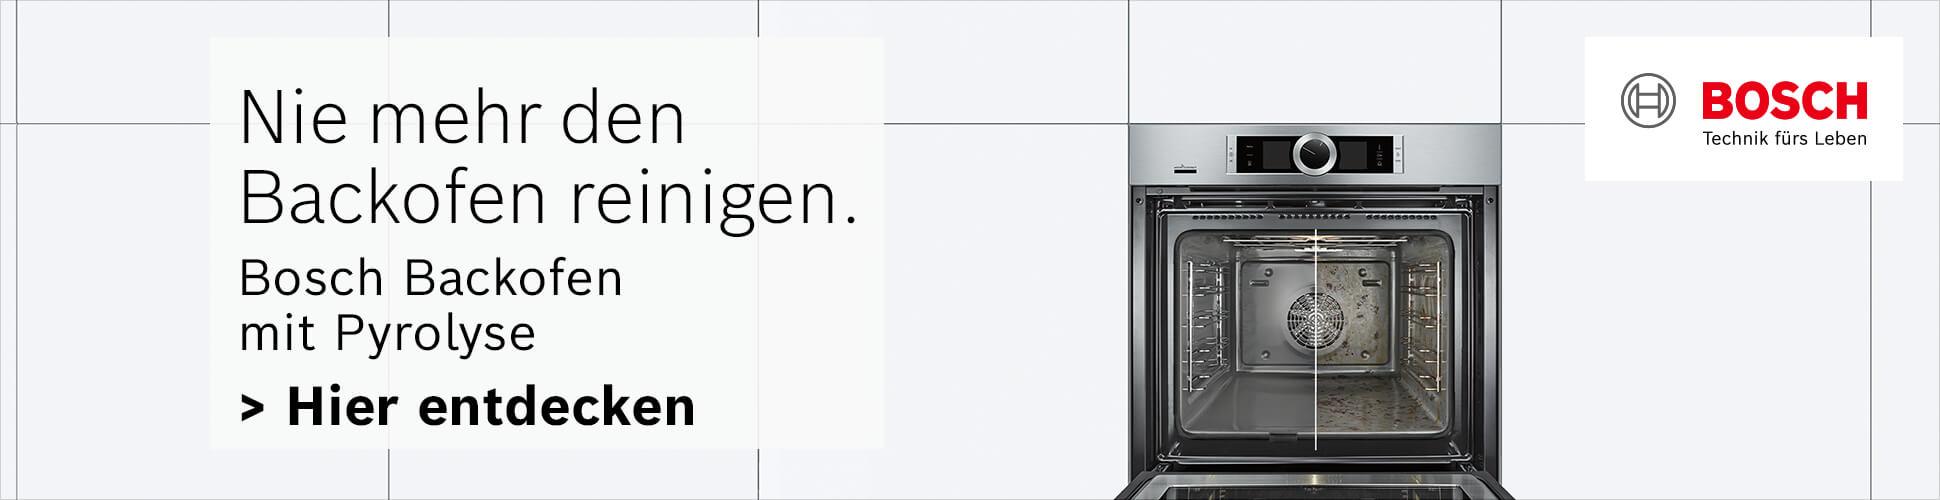 Sponsored Brand advertisement